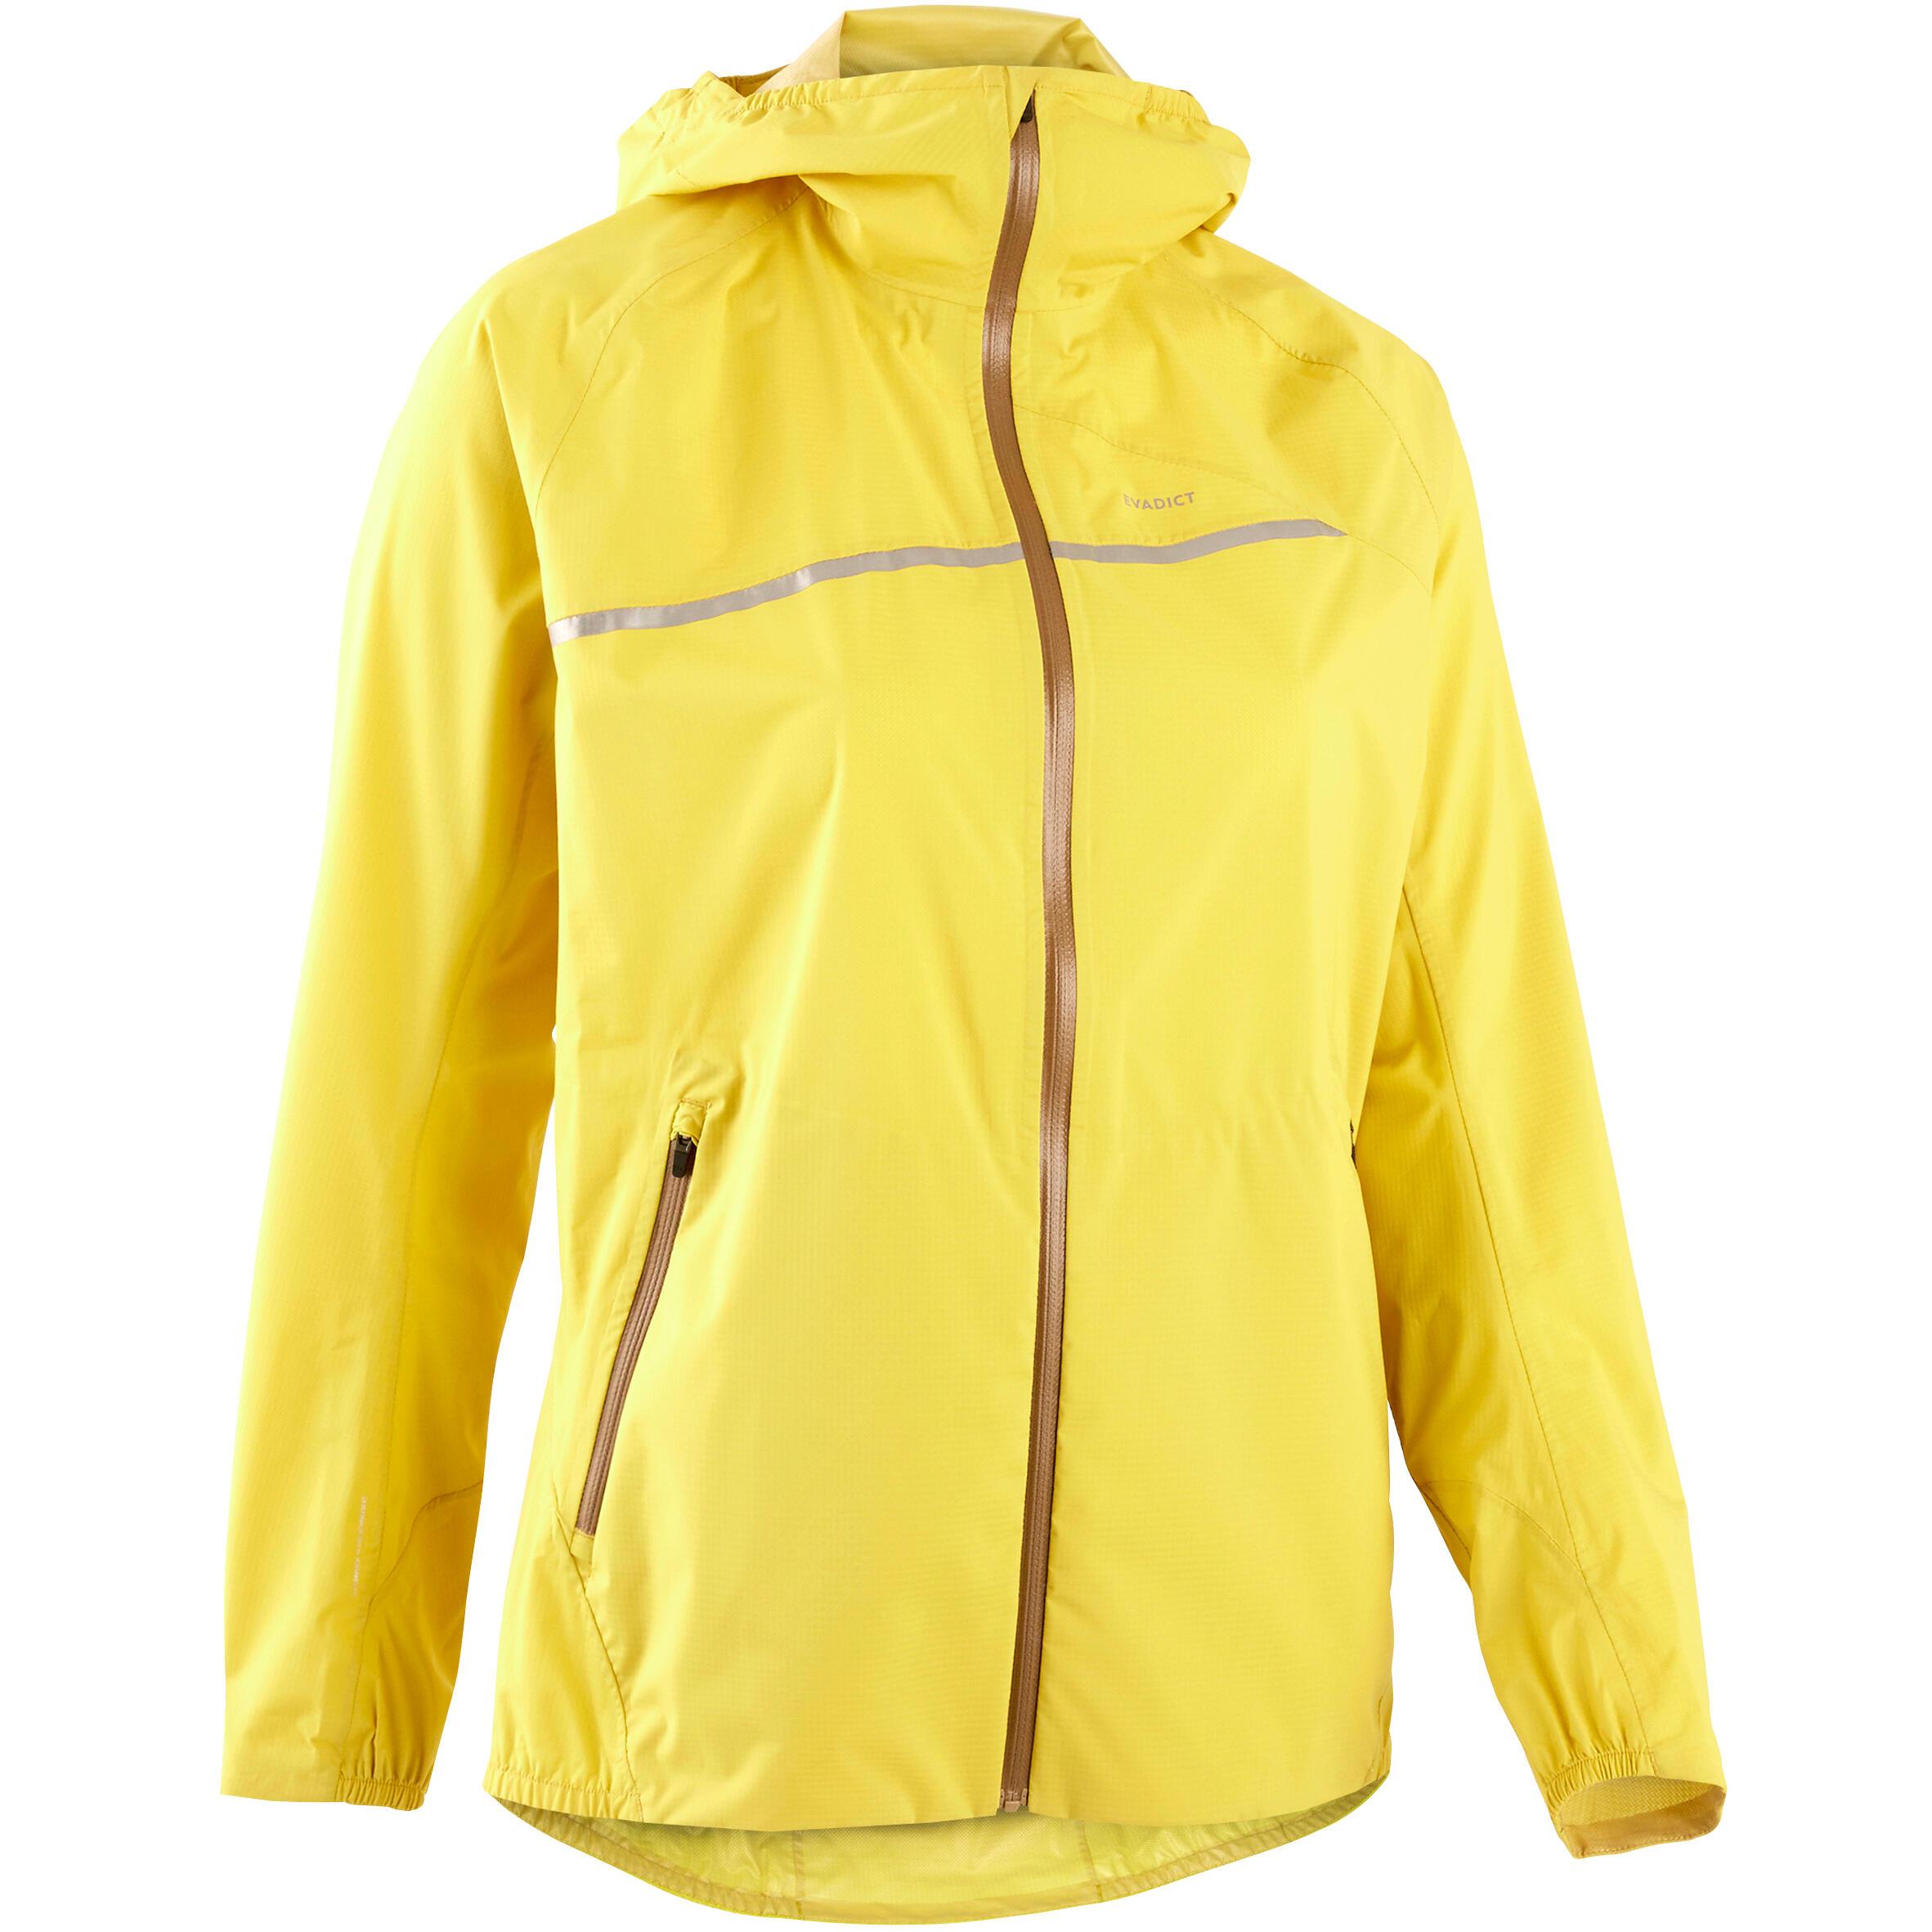 Jachetă Impermeabilă Trail la Reducere poza